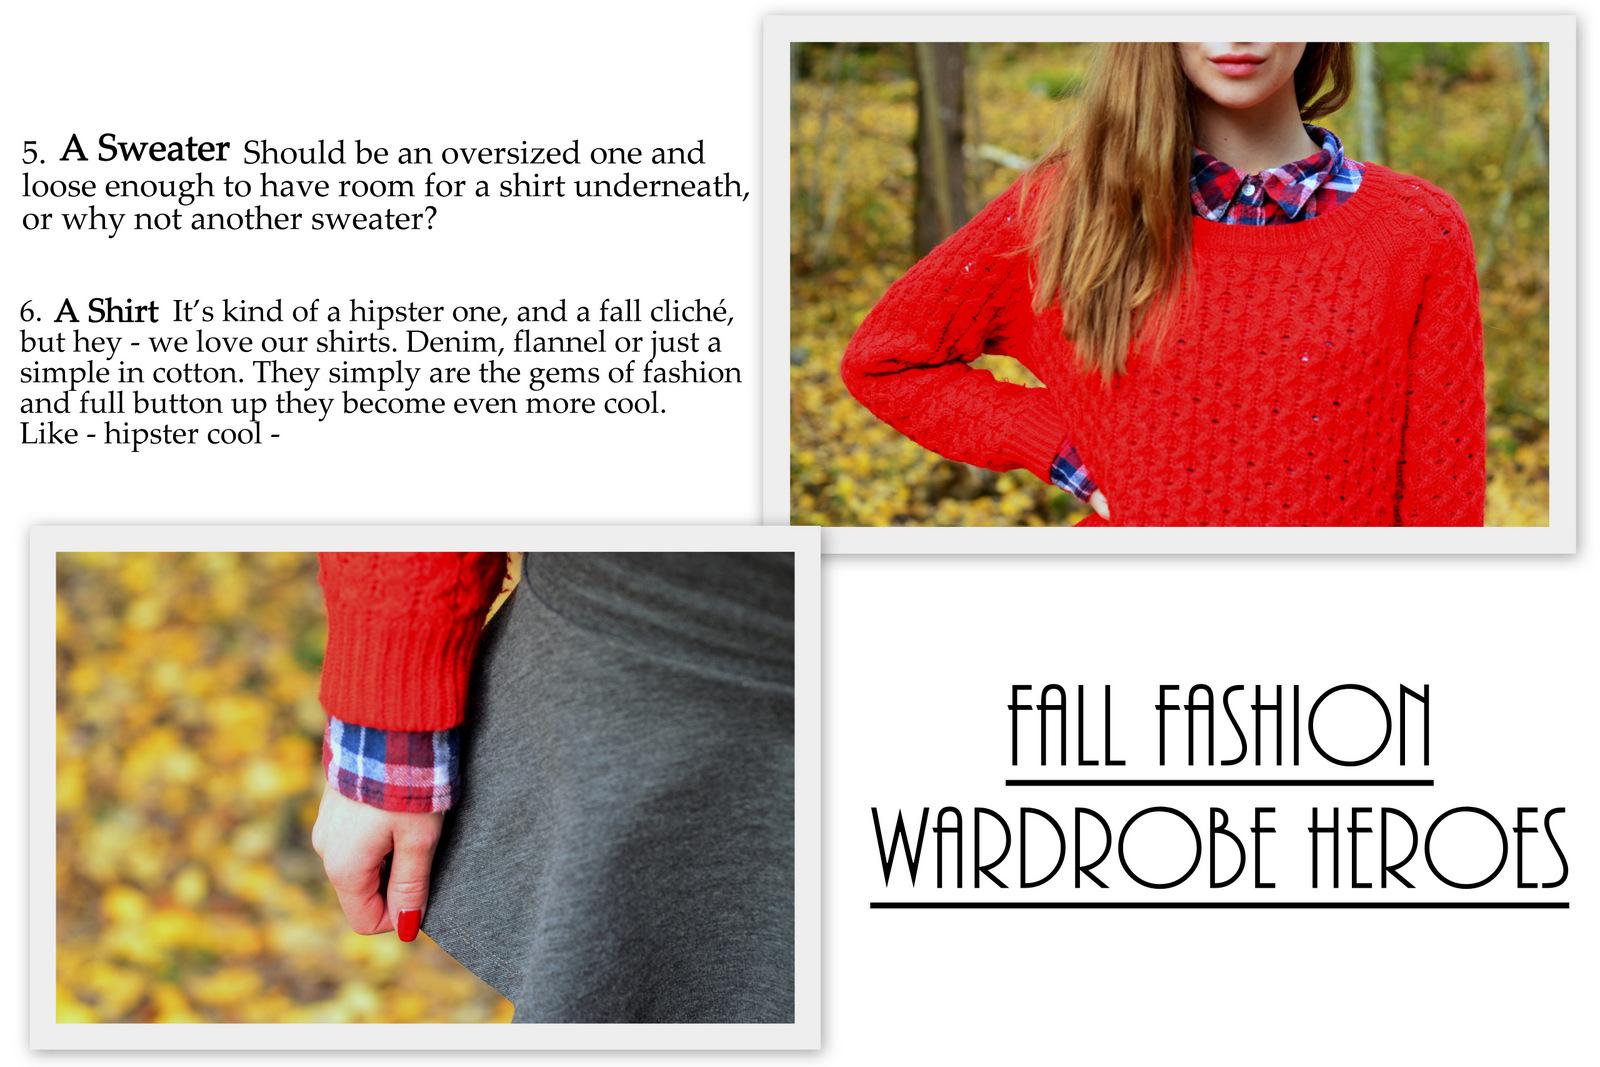 Fall Fashion Wardrobe Heroes1